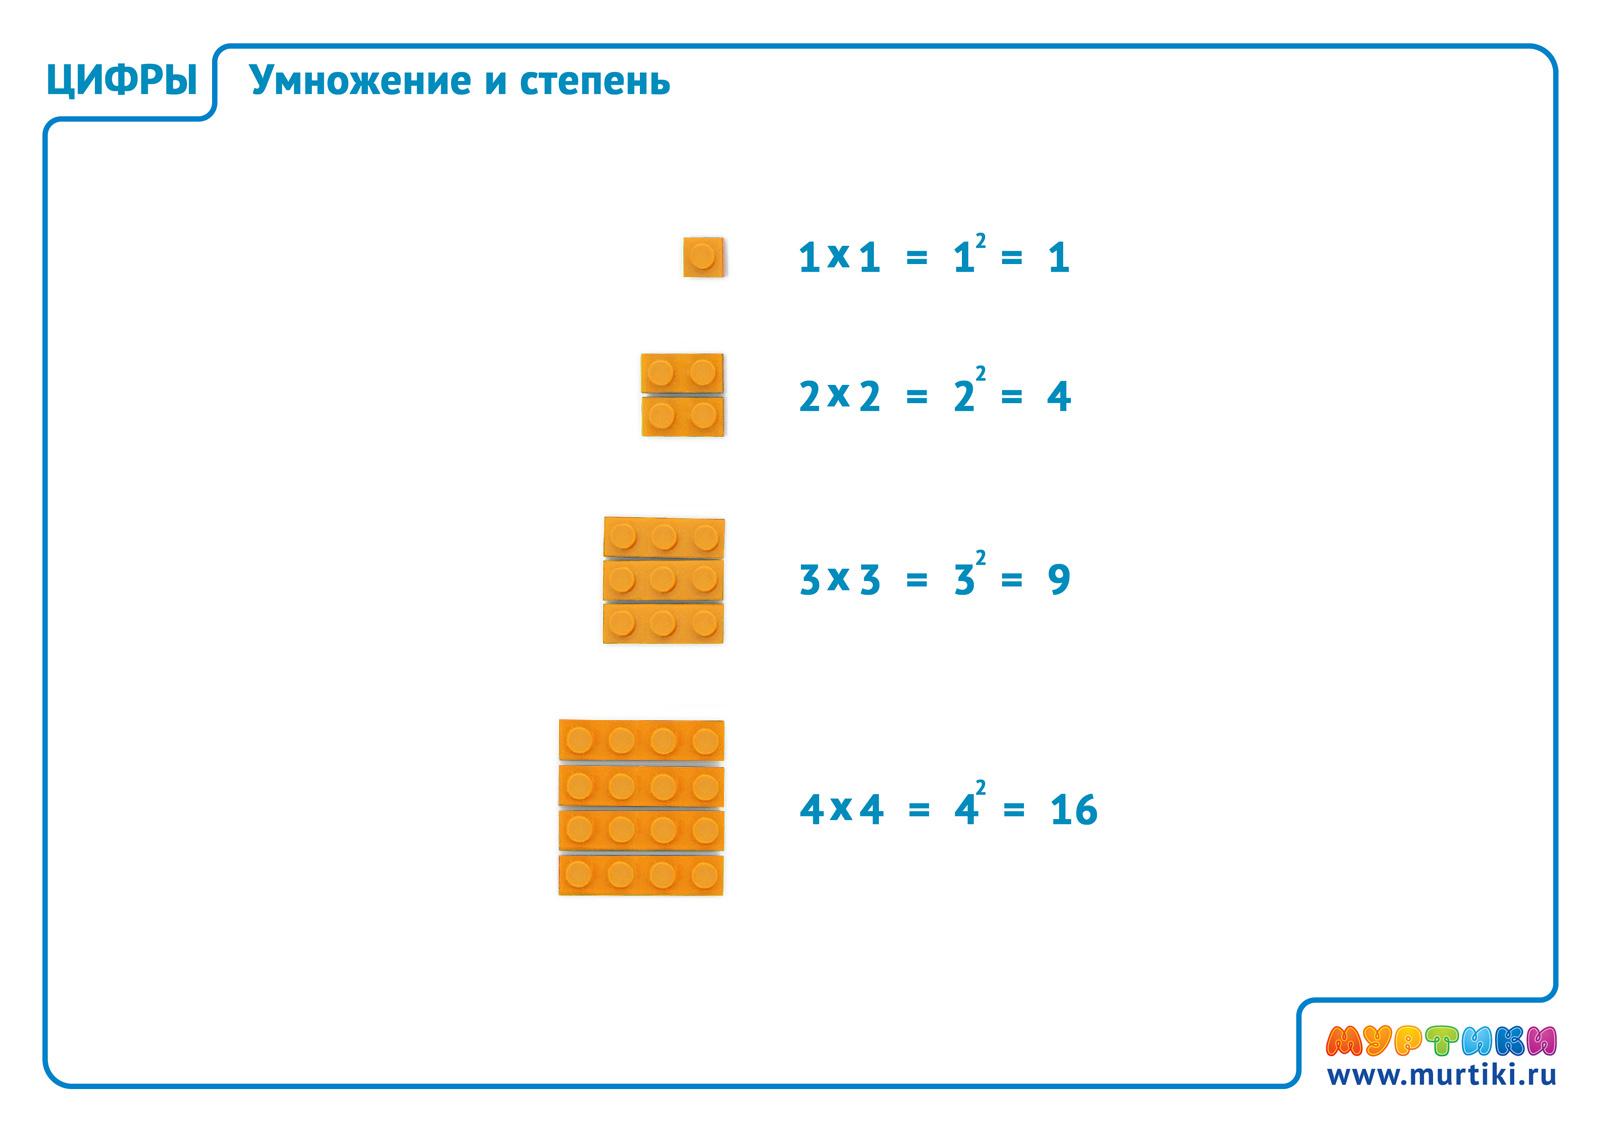 murtiki_lego_fraction04